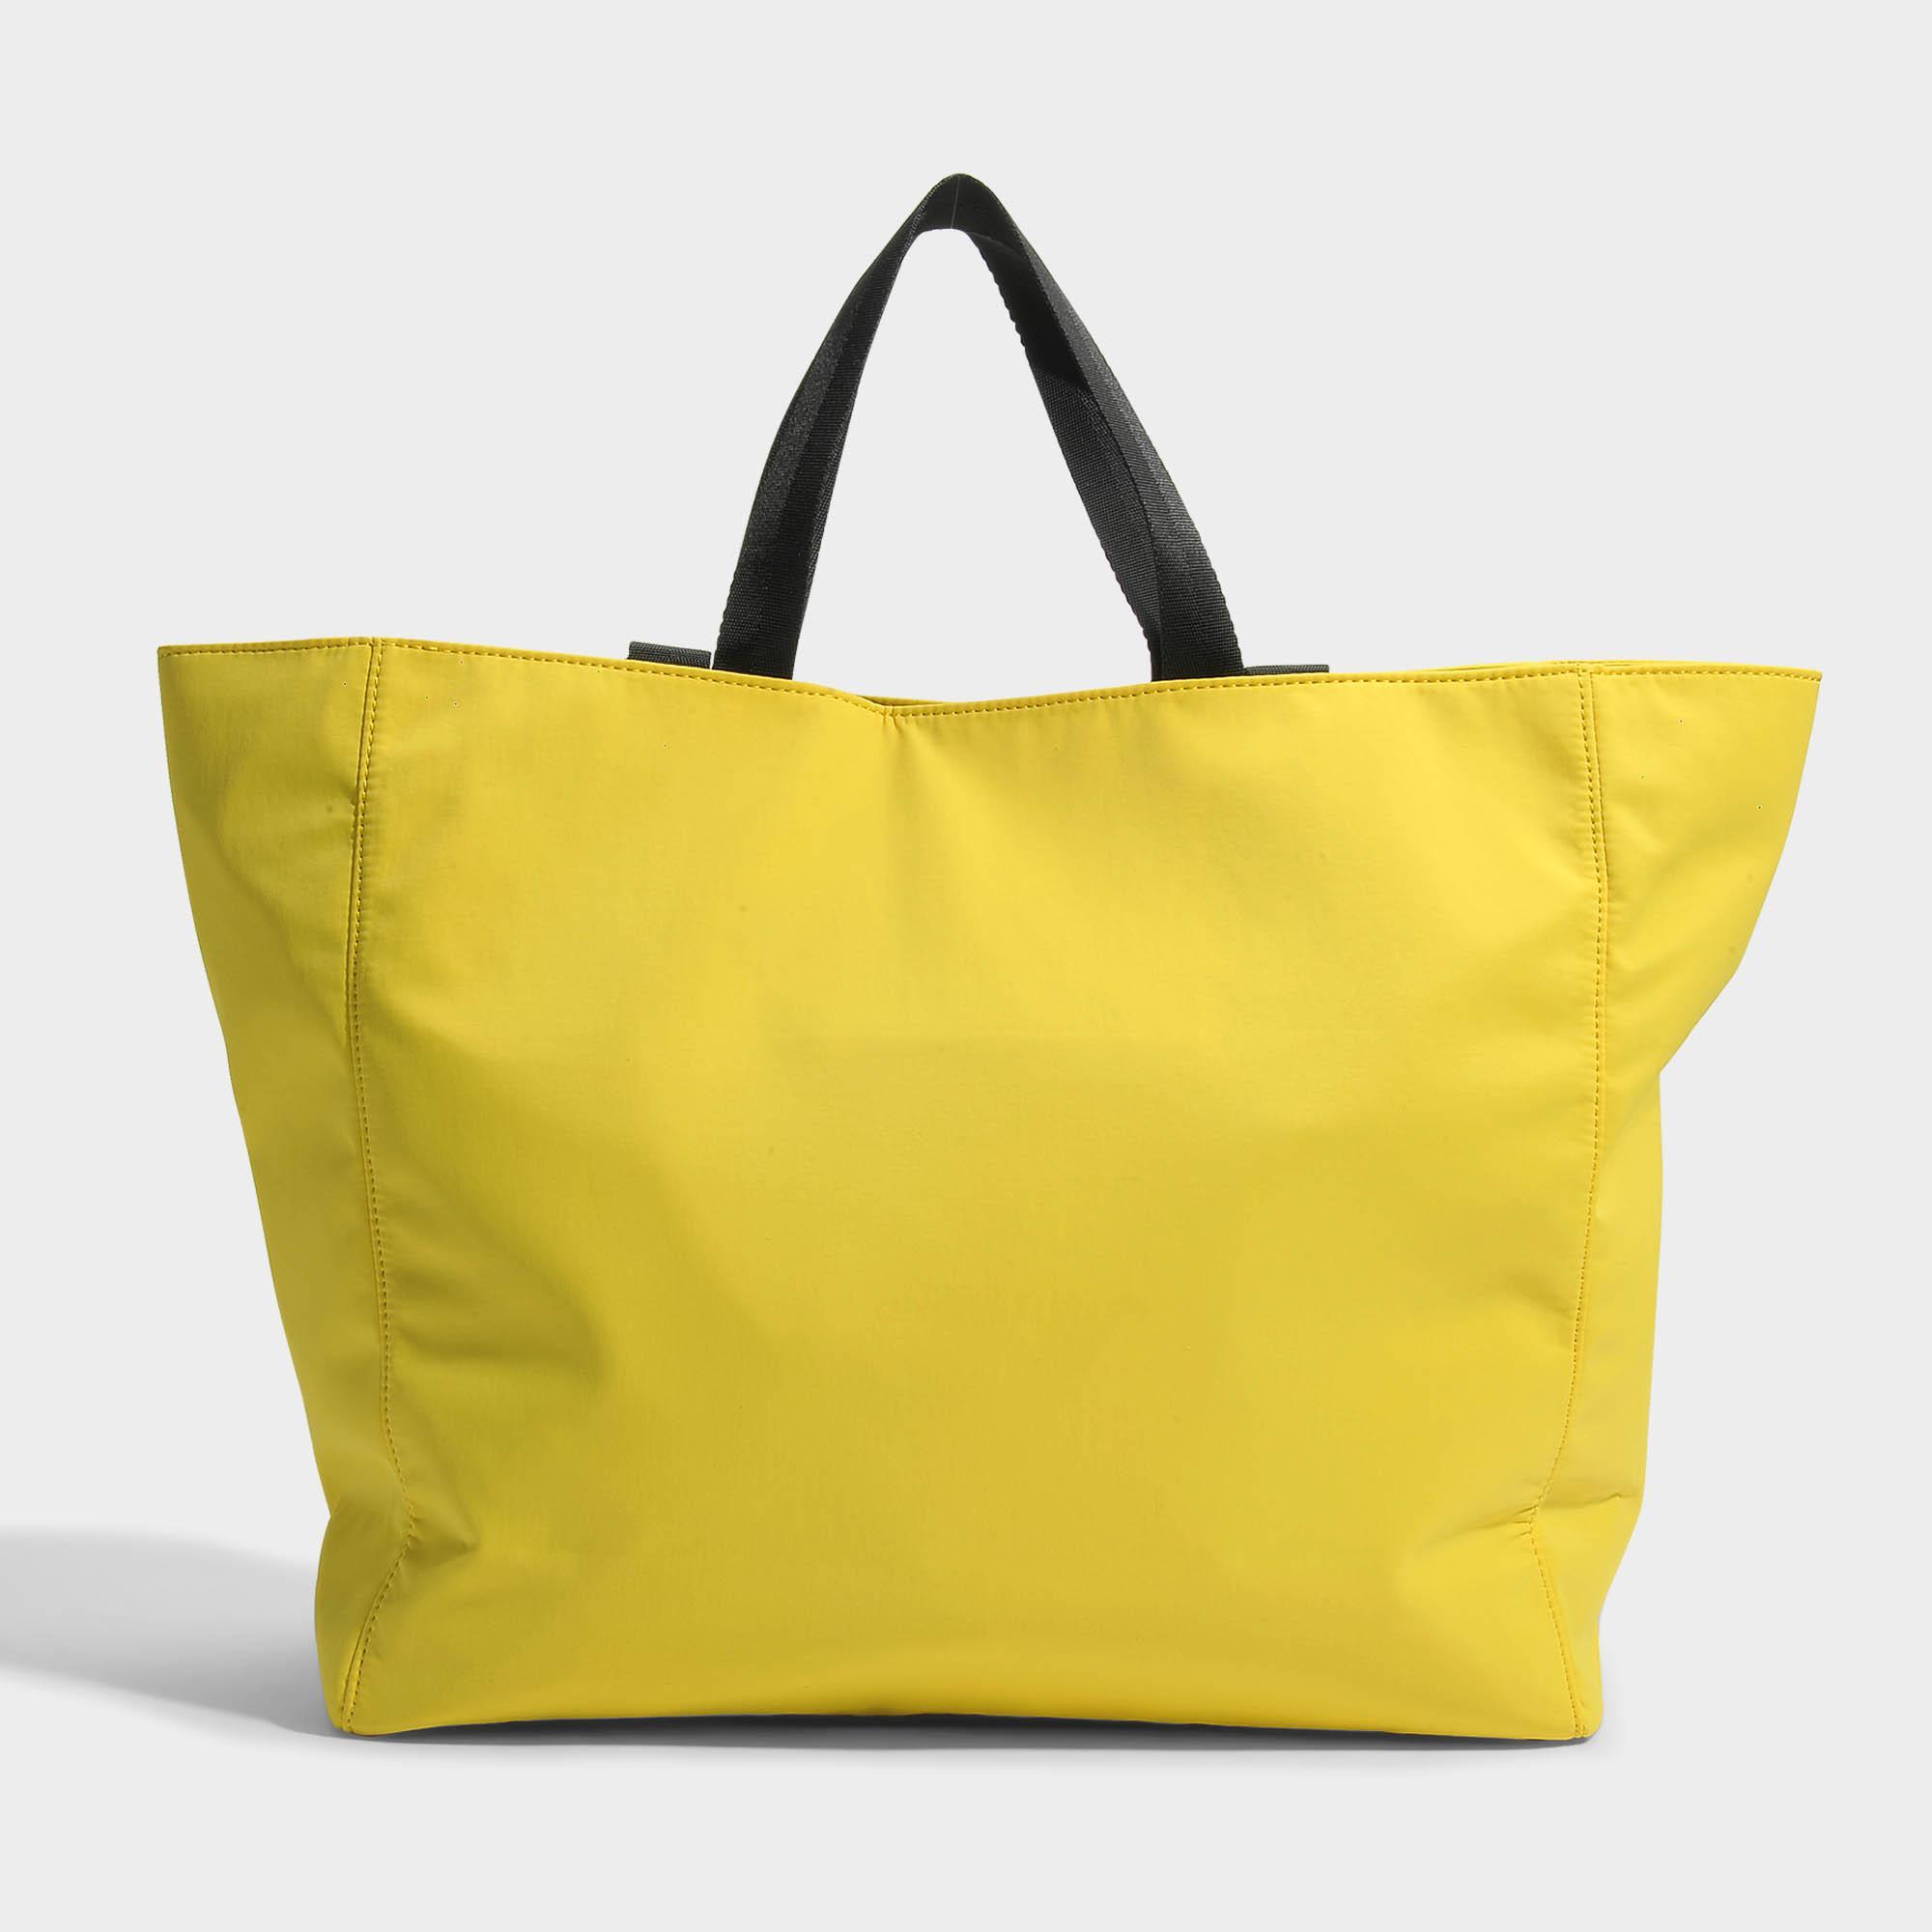 795c5e225 KENZO Sport Tote Bag In Citron Nylon in Yellow - Lyst